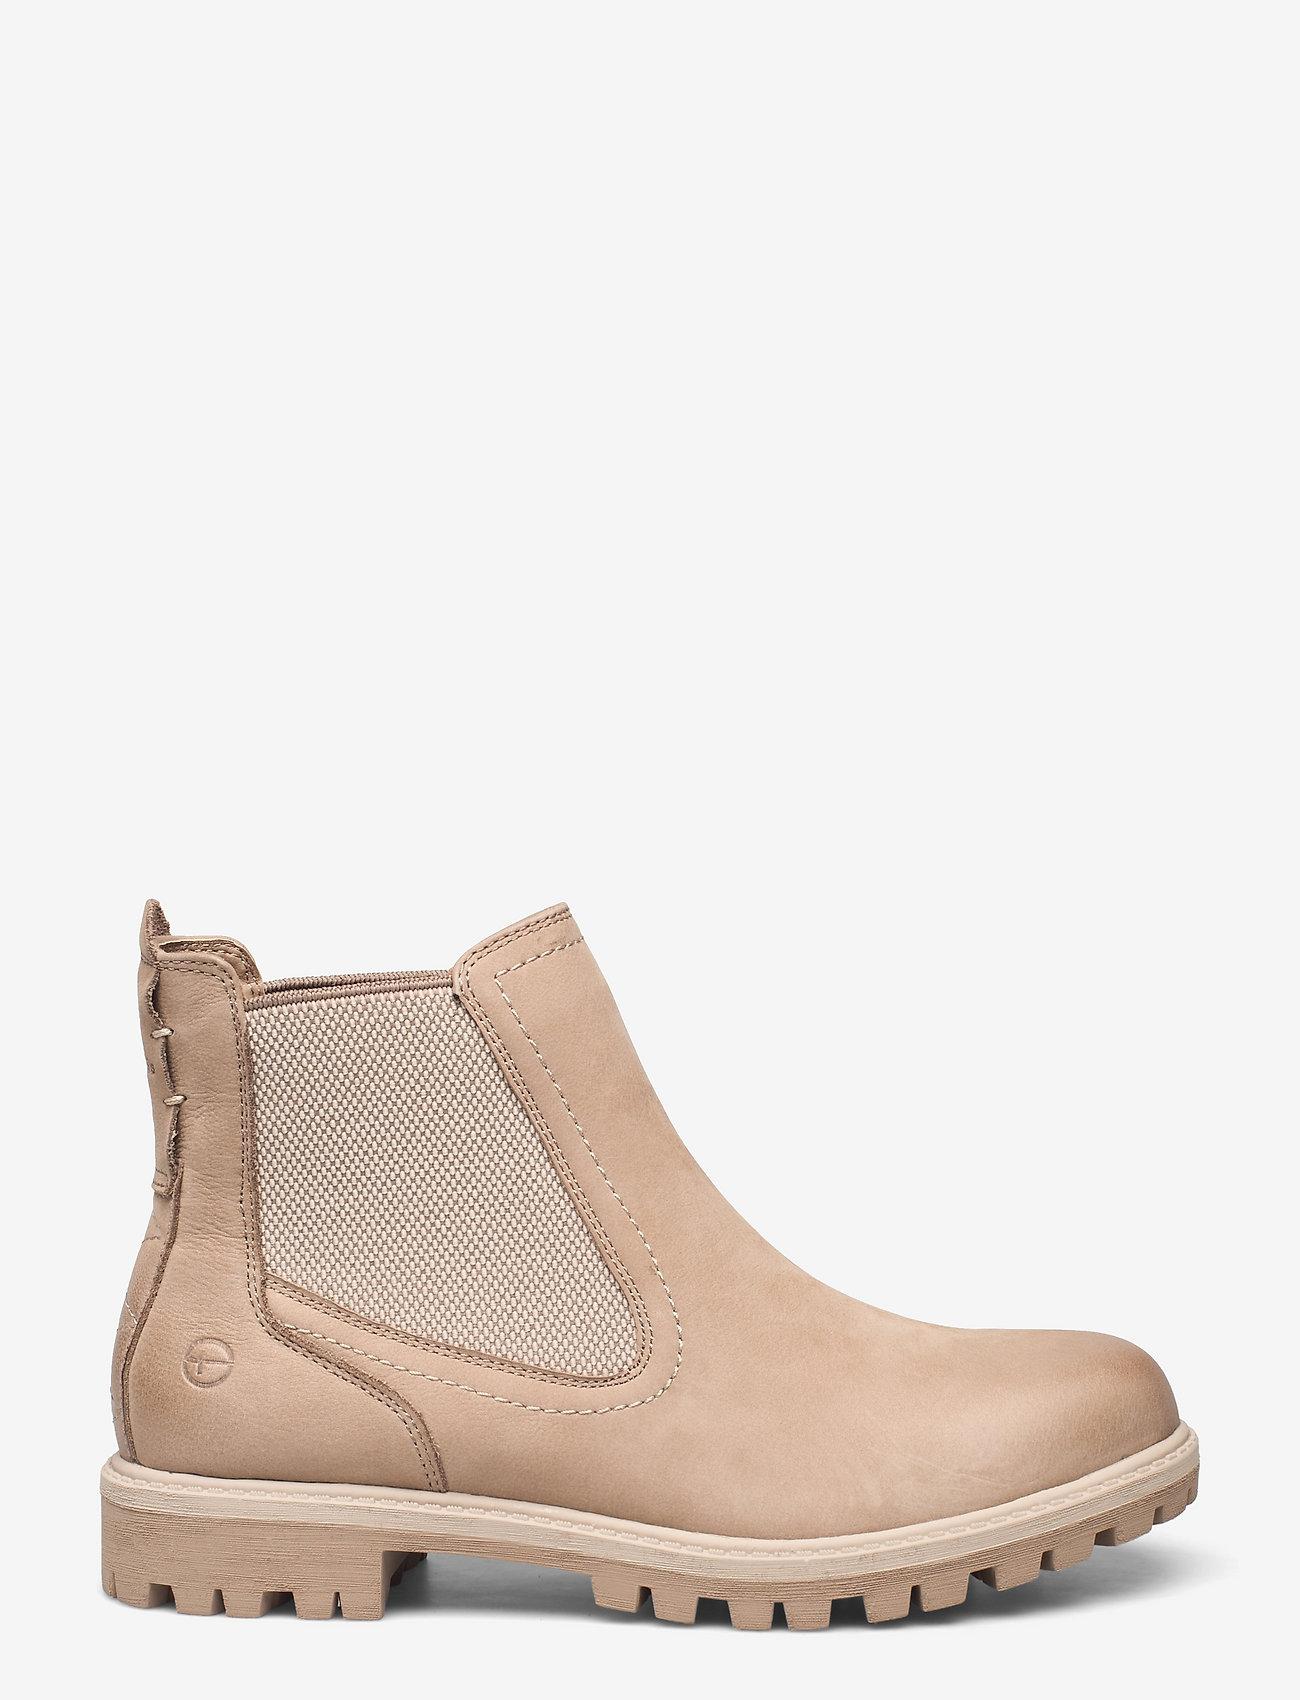 Tamaris - Woms Boots - Papaw - chelsea stila zābaki - taupe - 1